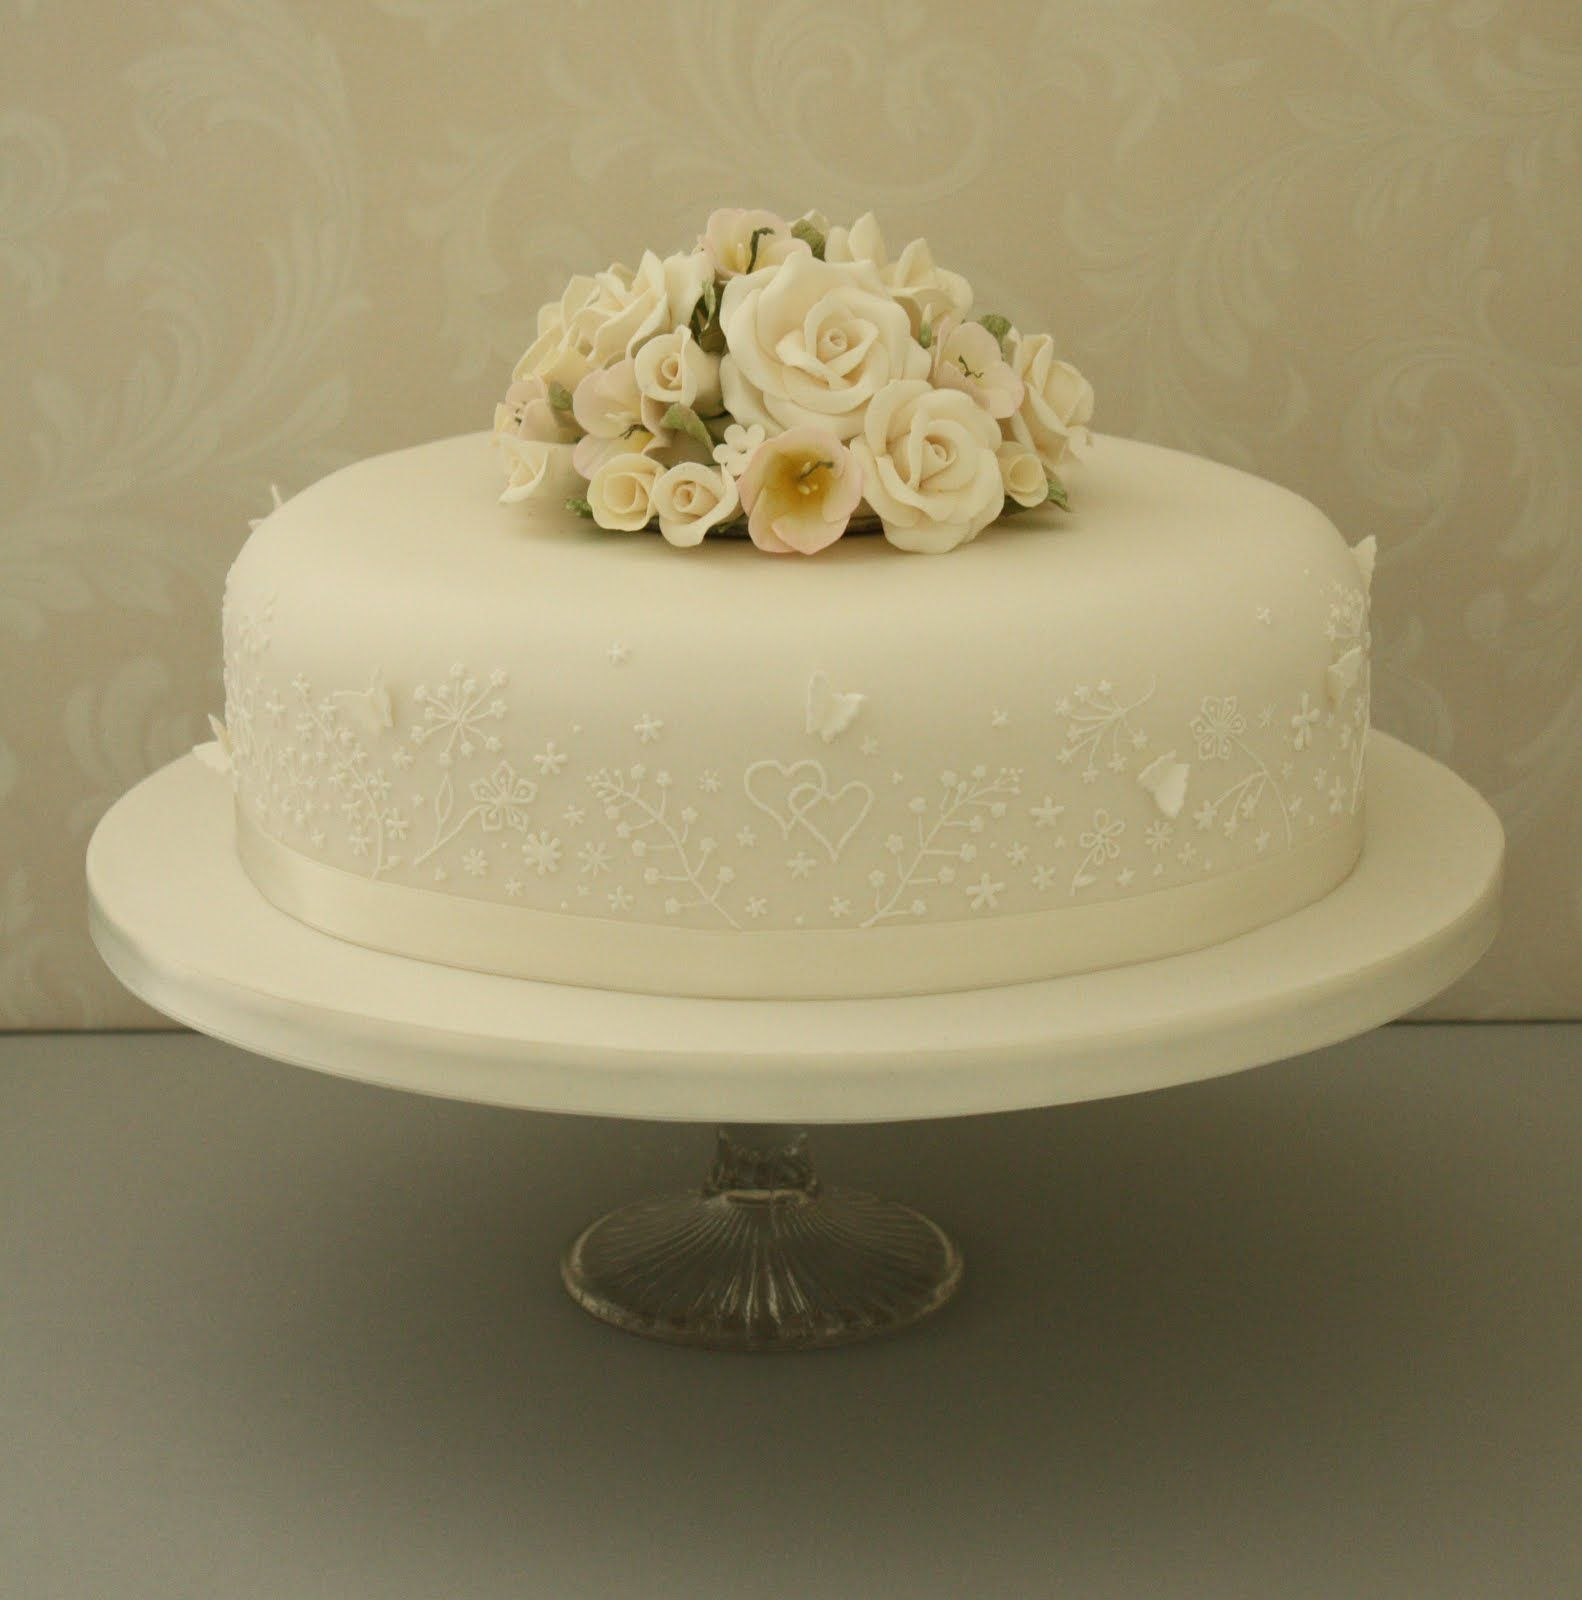 Elegant Single Tier Wedding Cakes Vintage Wedding Cake Designs Simple Tiered Wedding Cake